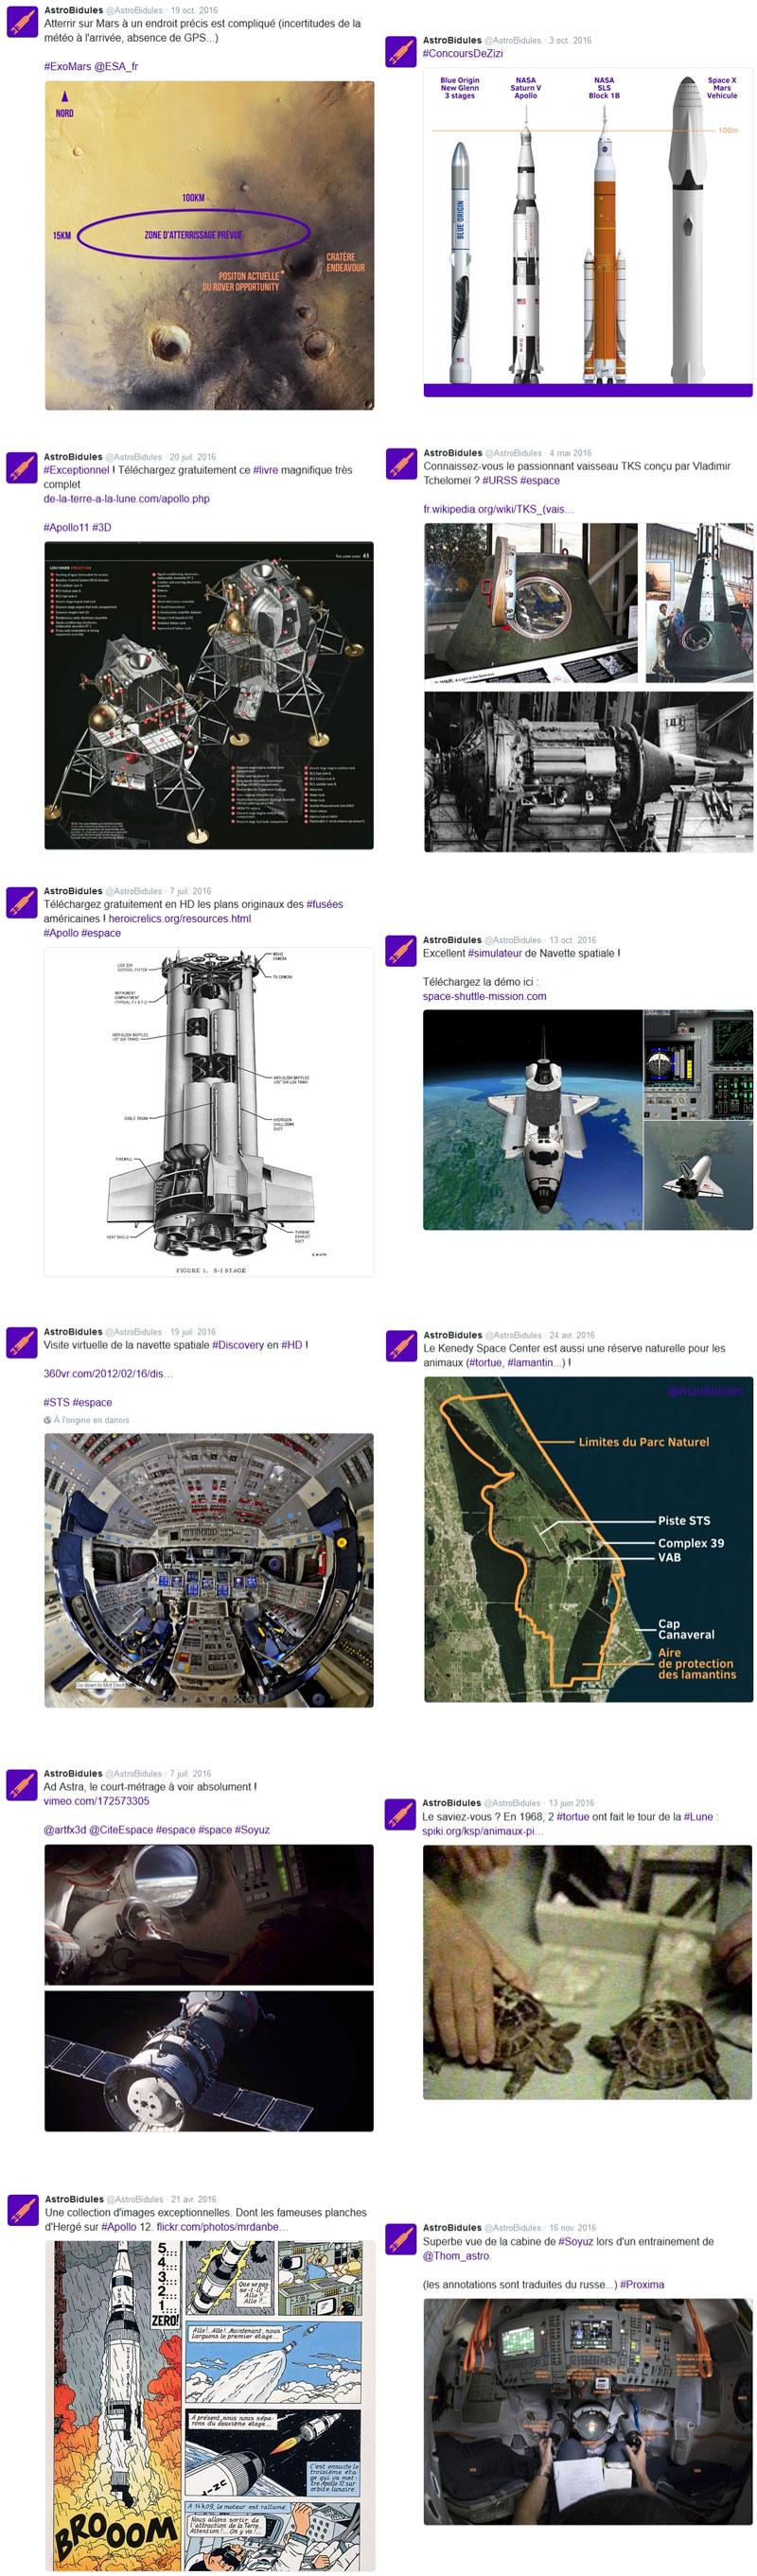 AstroBidules Tweet